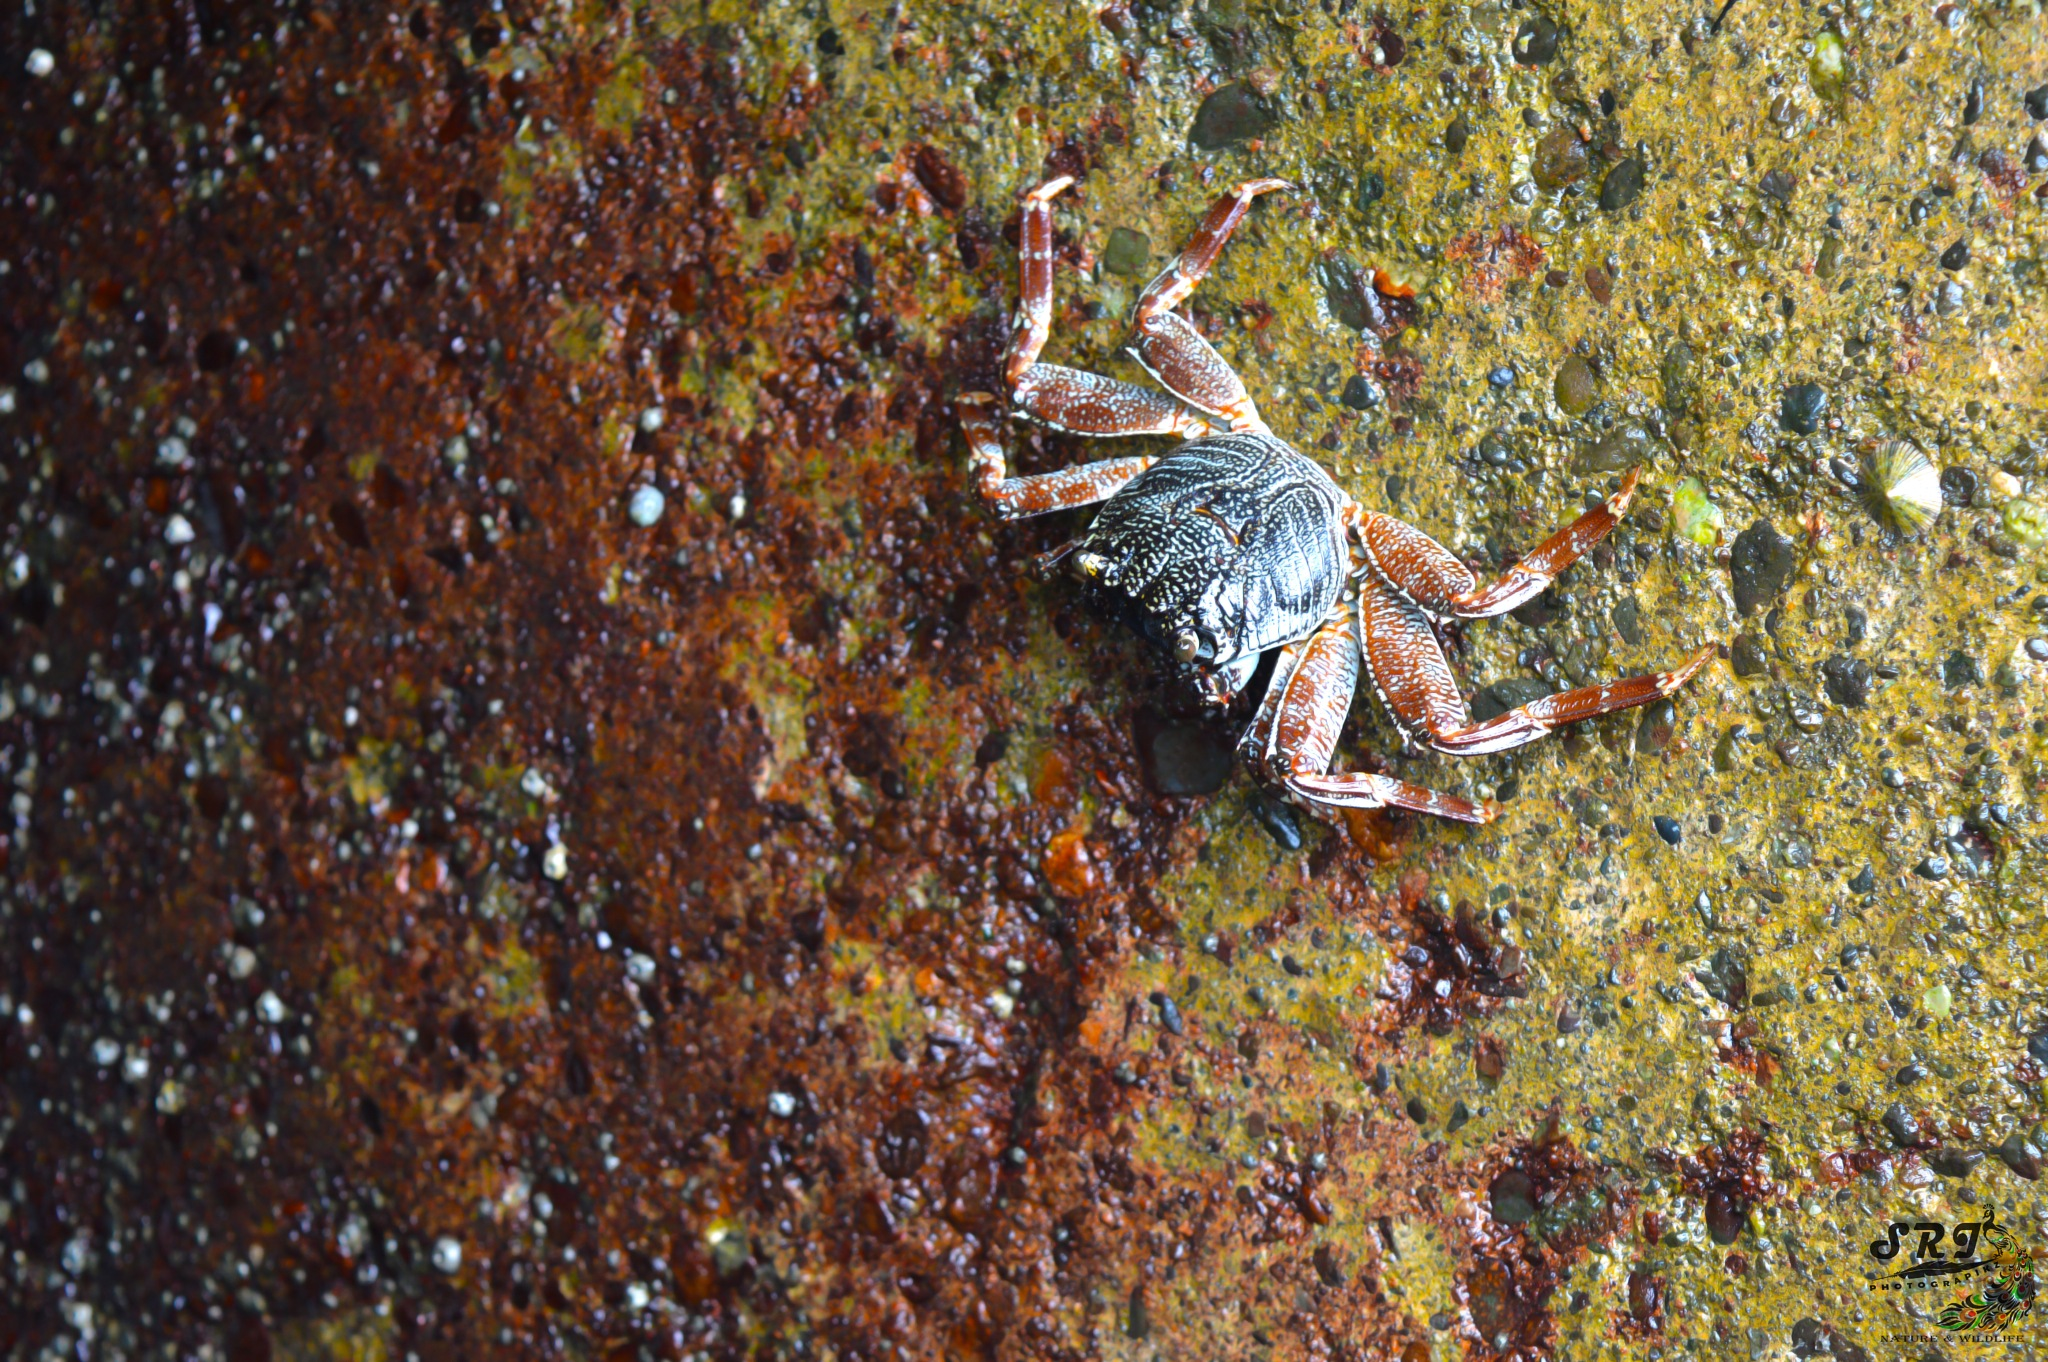 Sea crab by Jawahar srinath